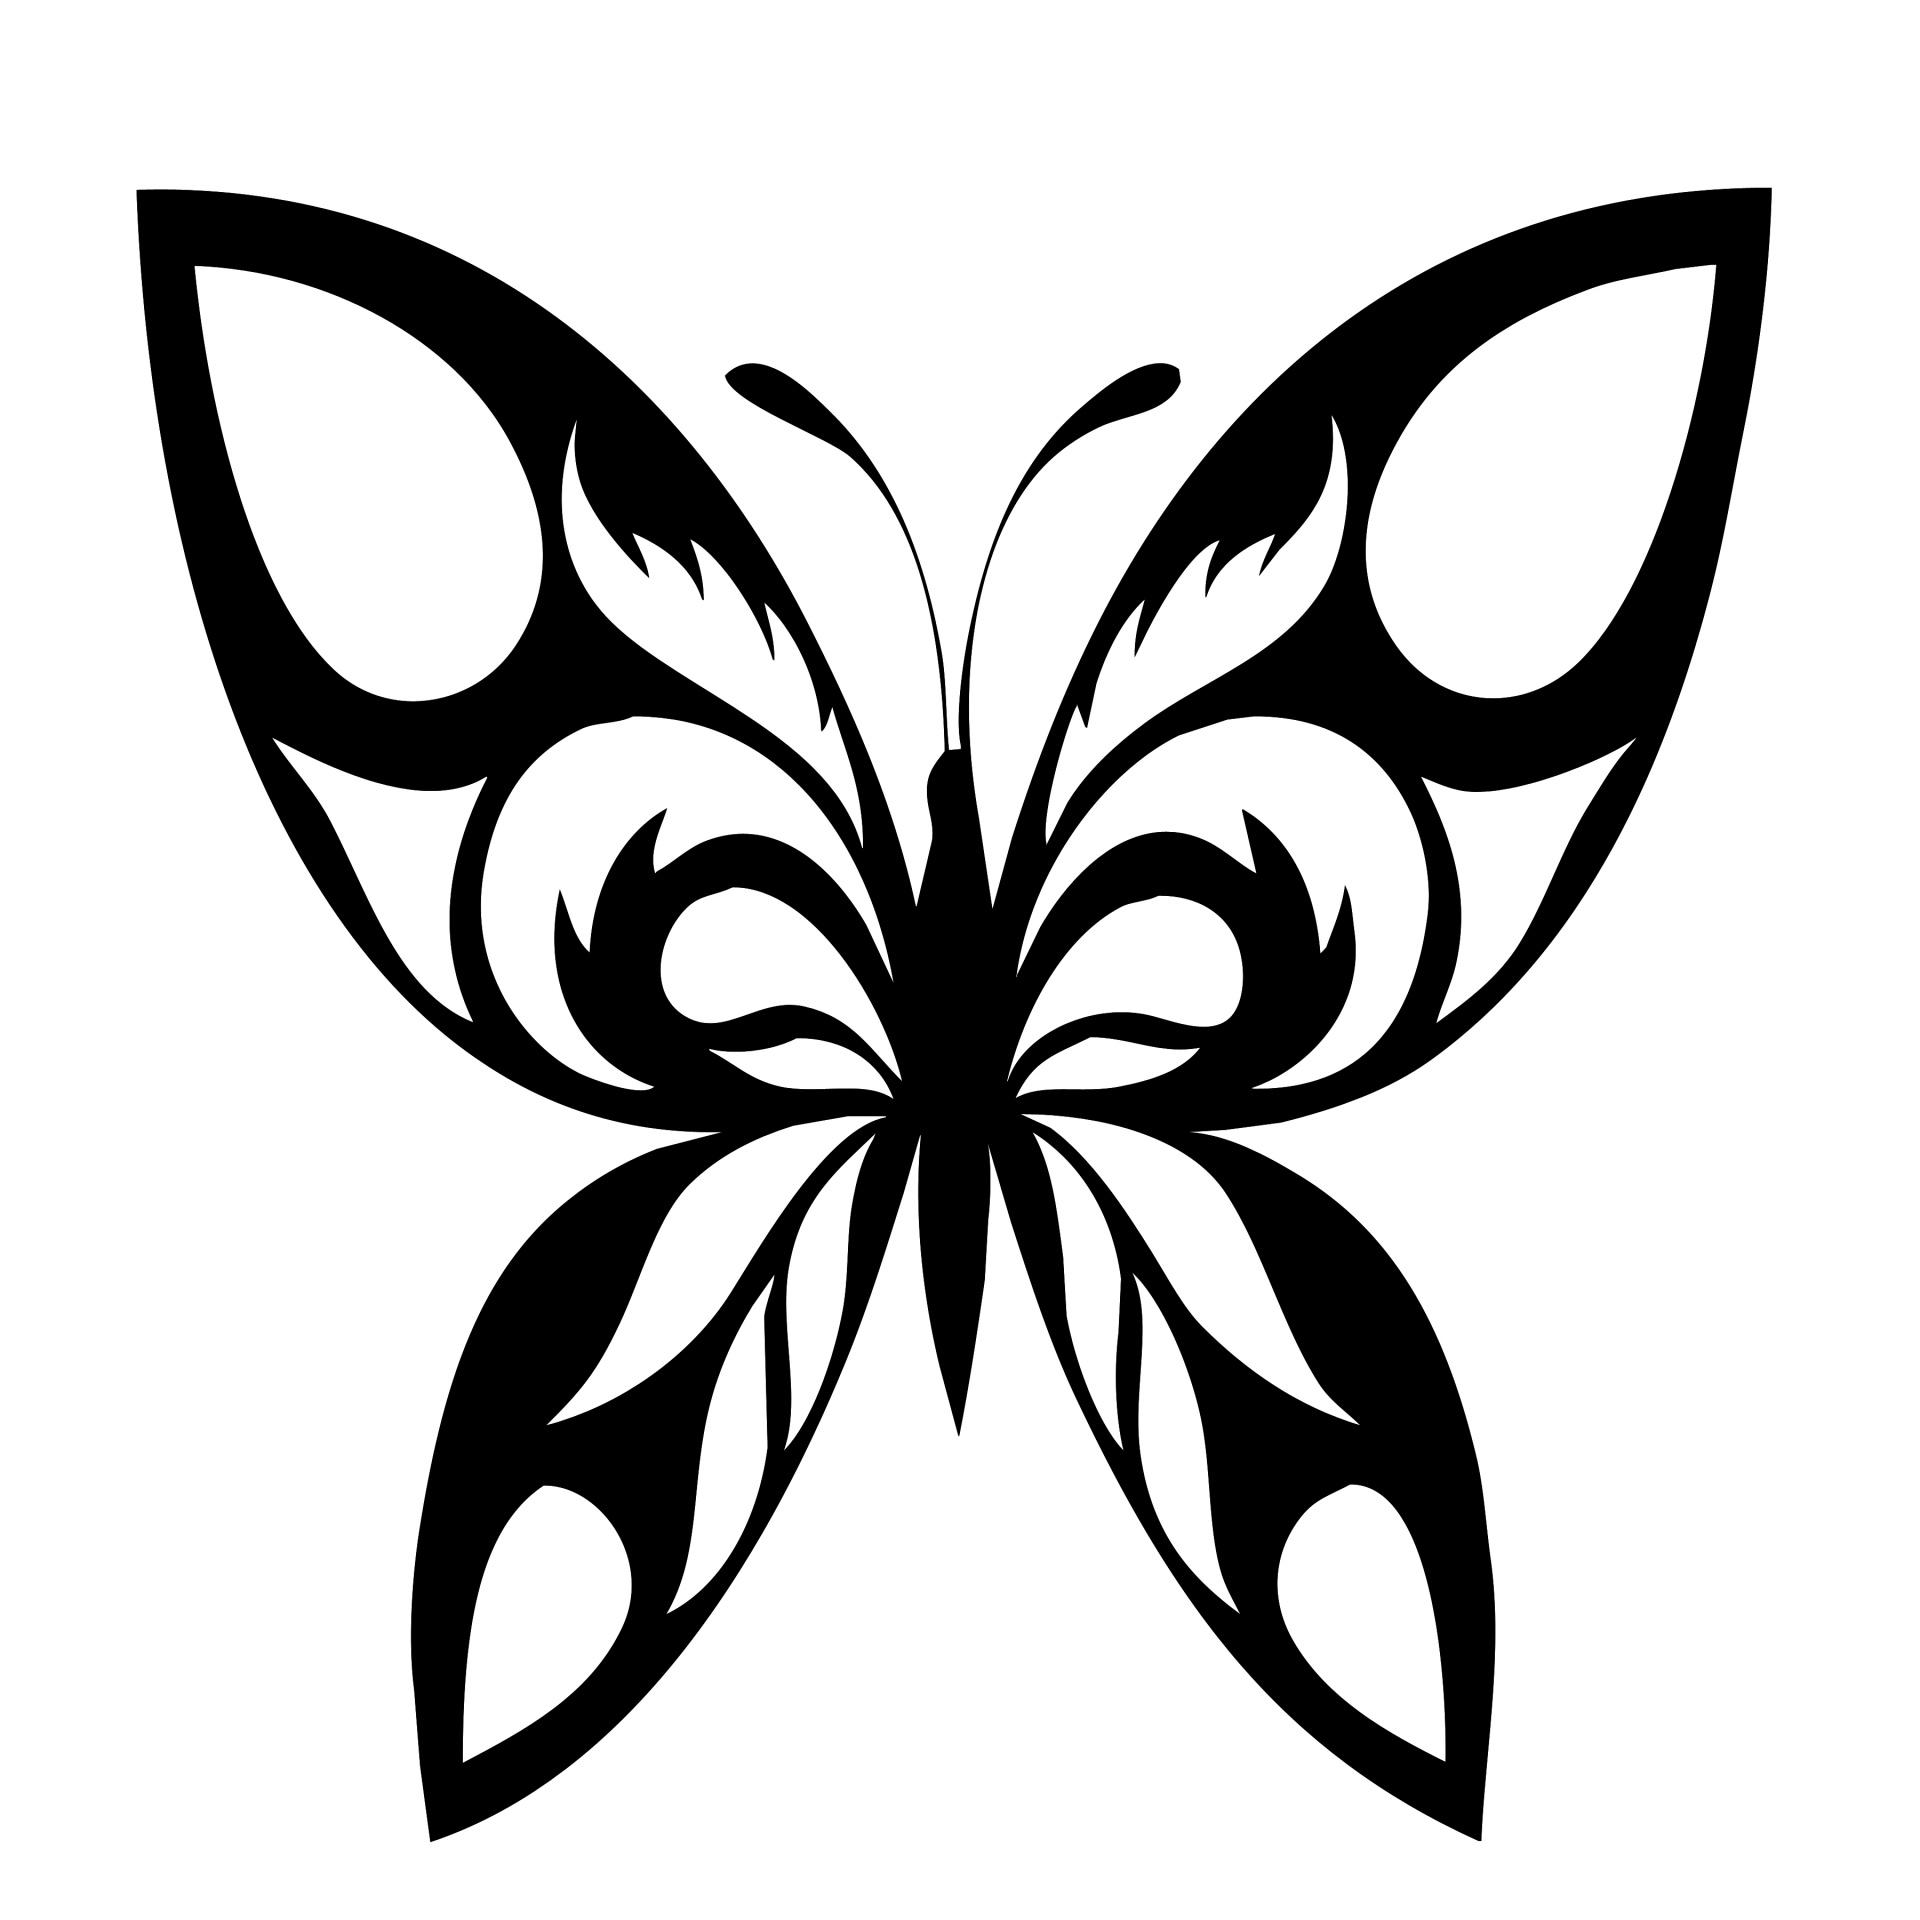 Butterfly Silhouette Black Motif Free Stock Photo